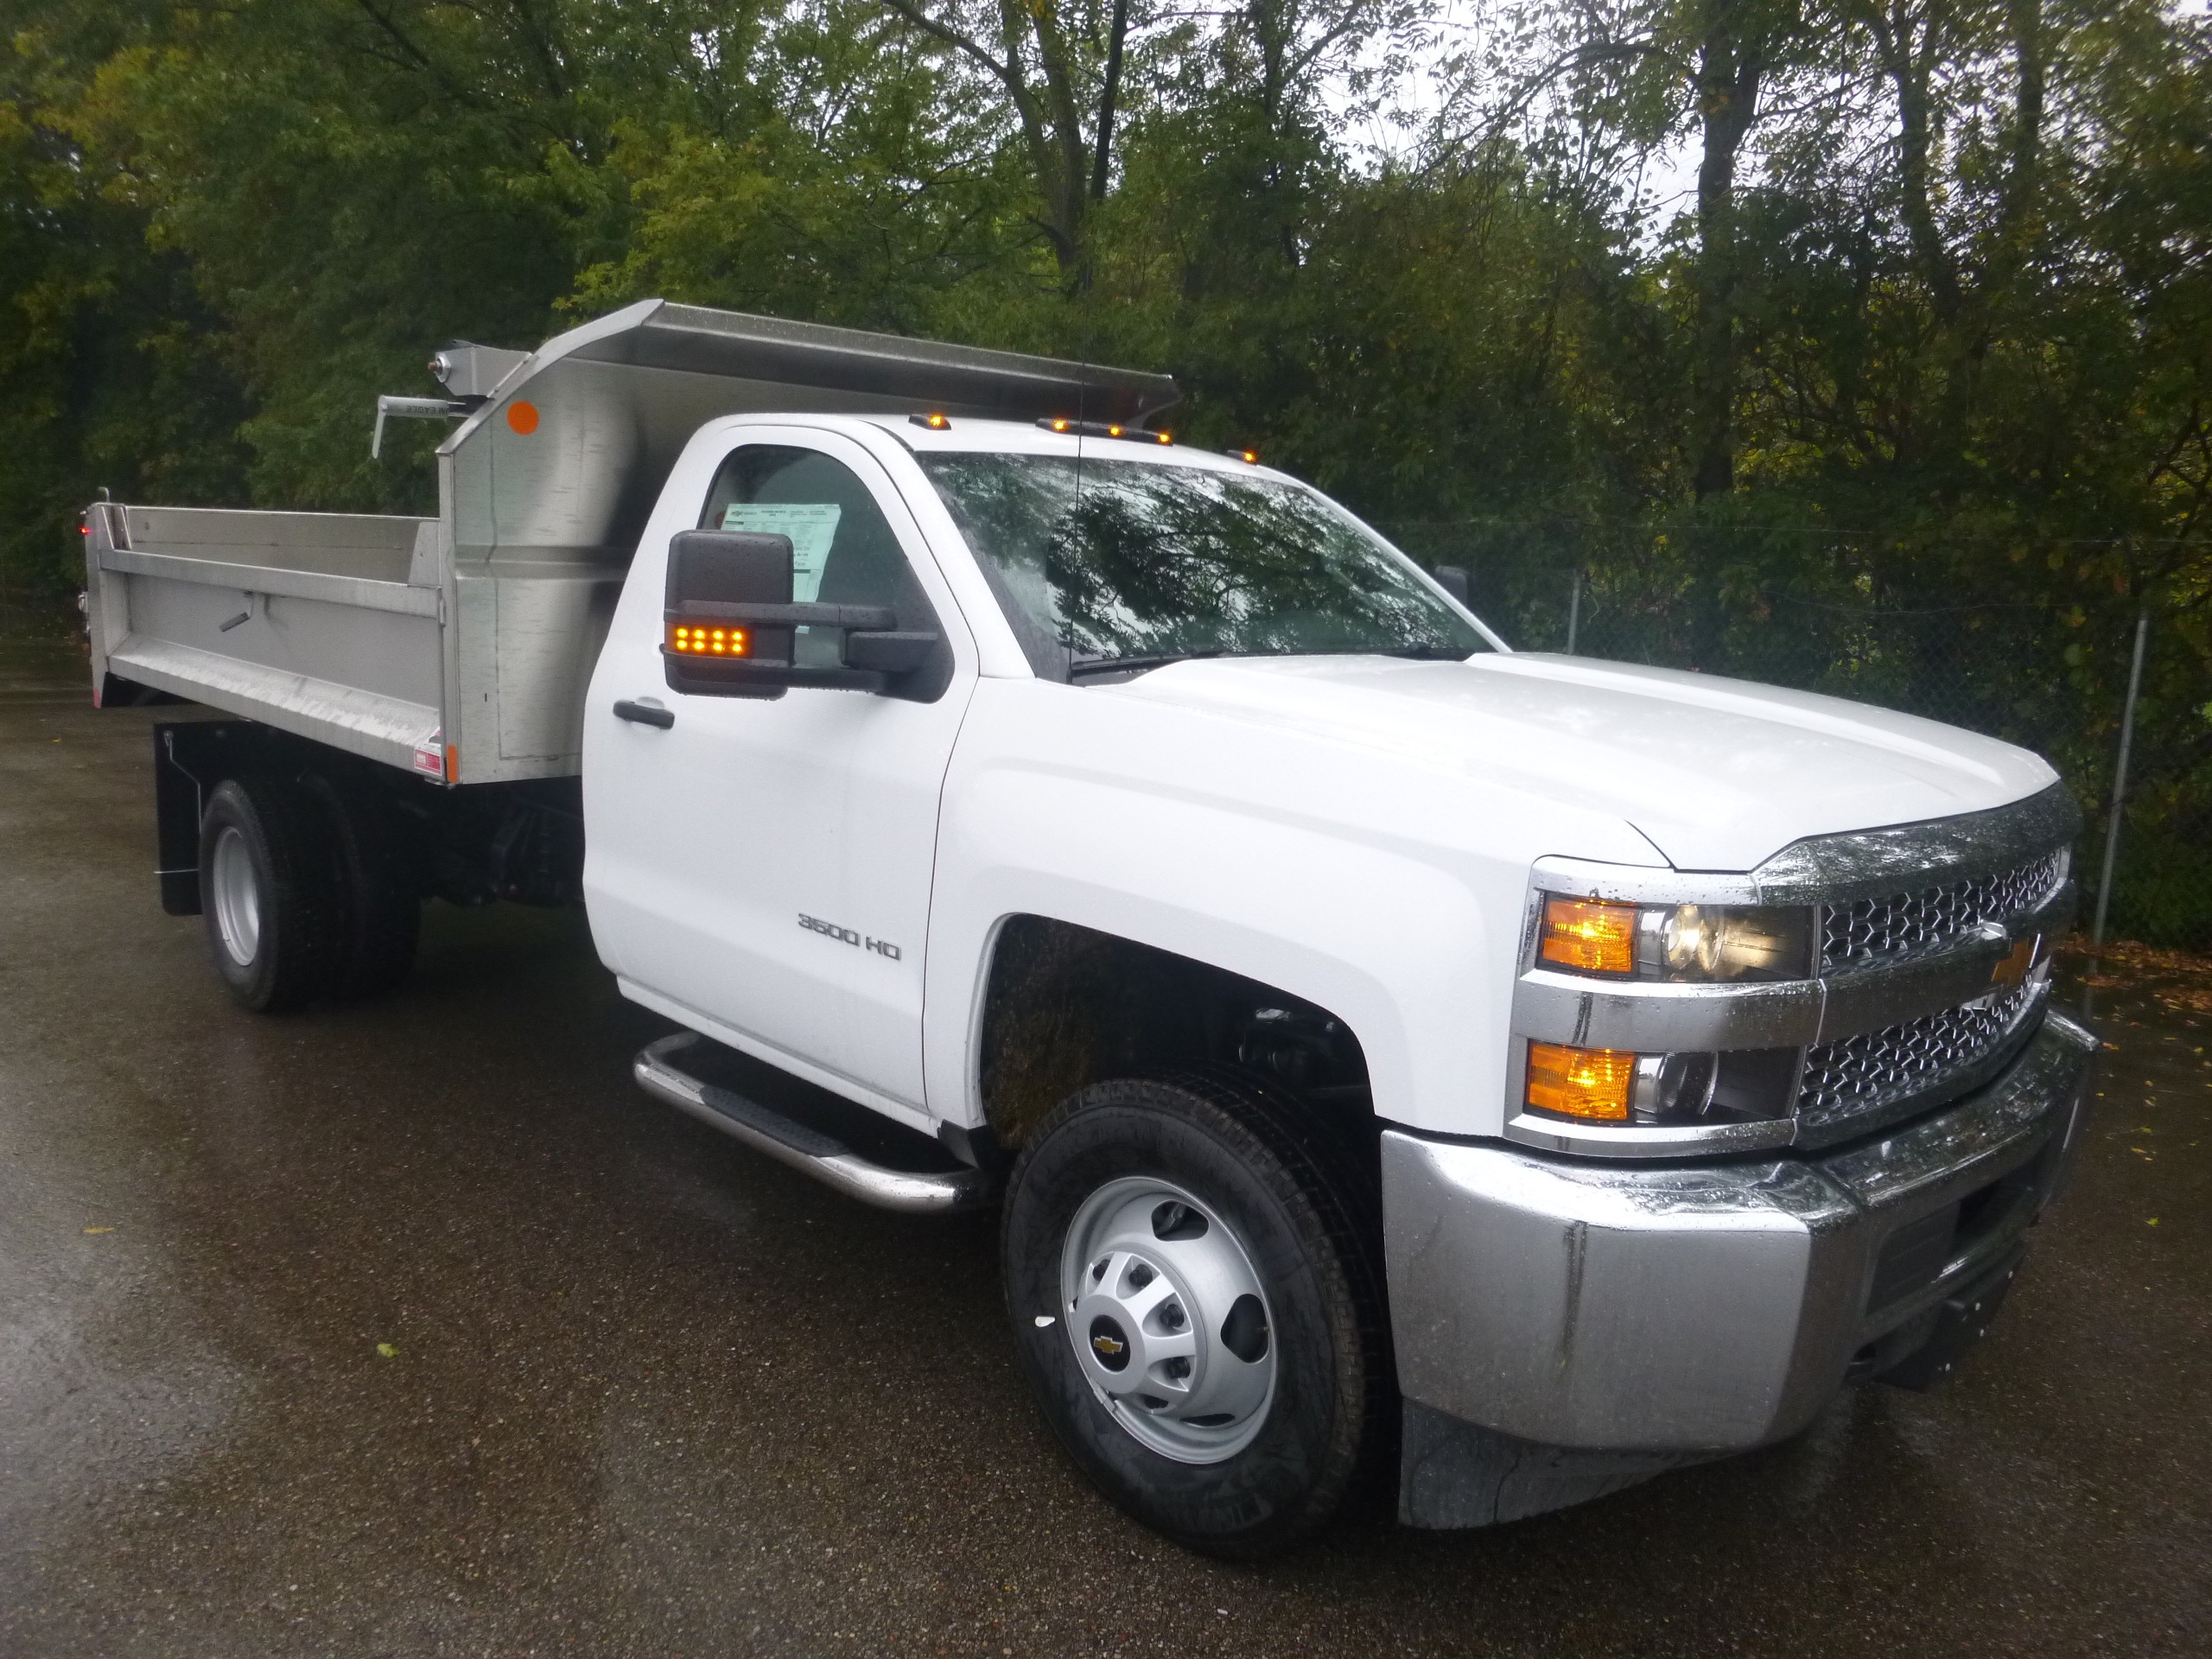 Fagan Truck Trailer Janesville Wisconsin Sells Isuzu